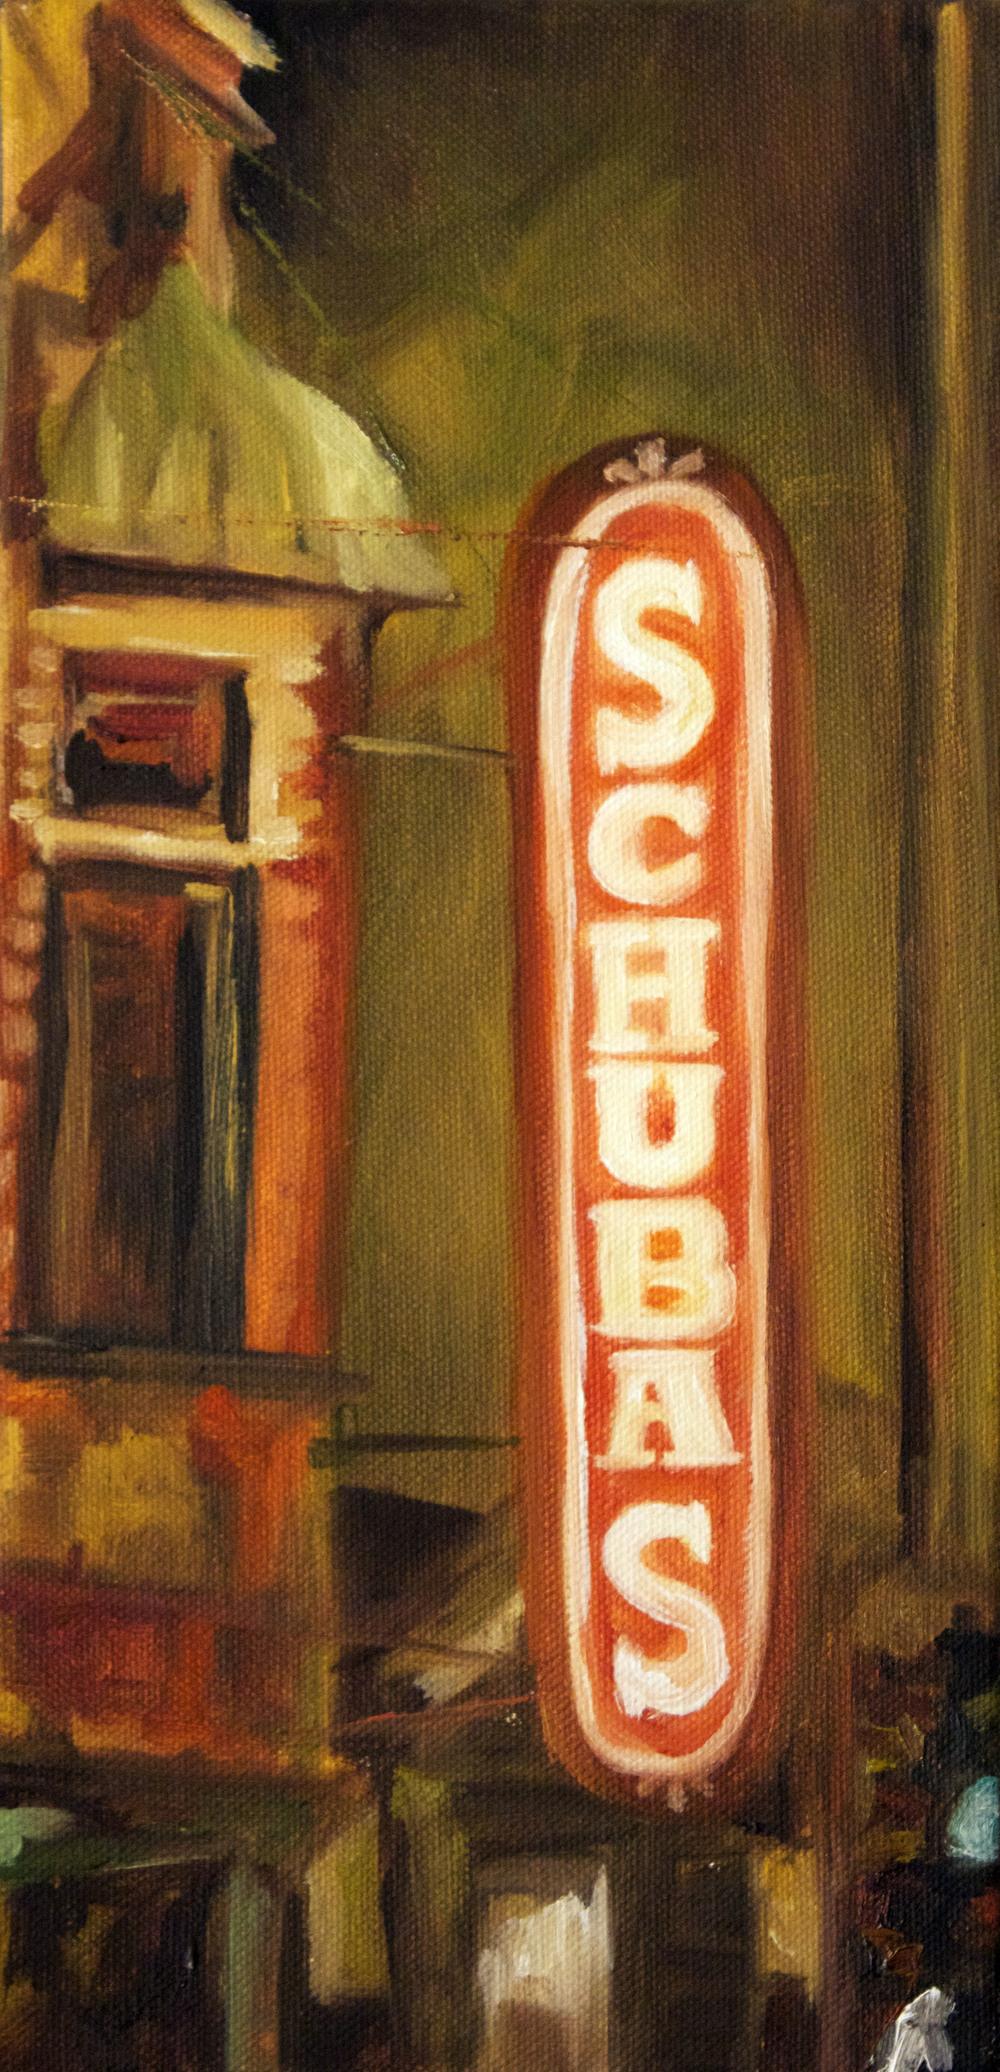 Schuba's